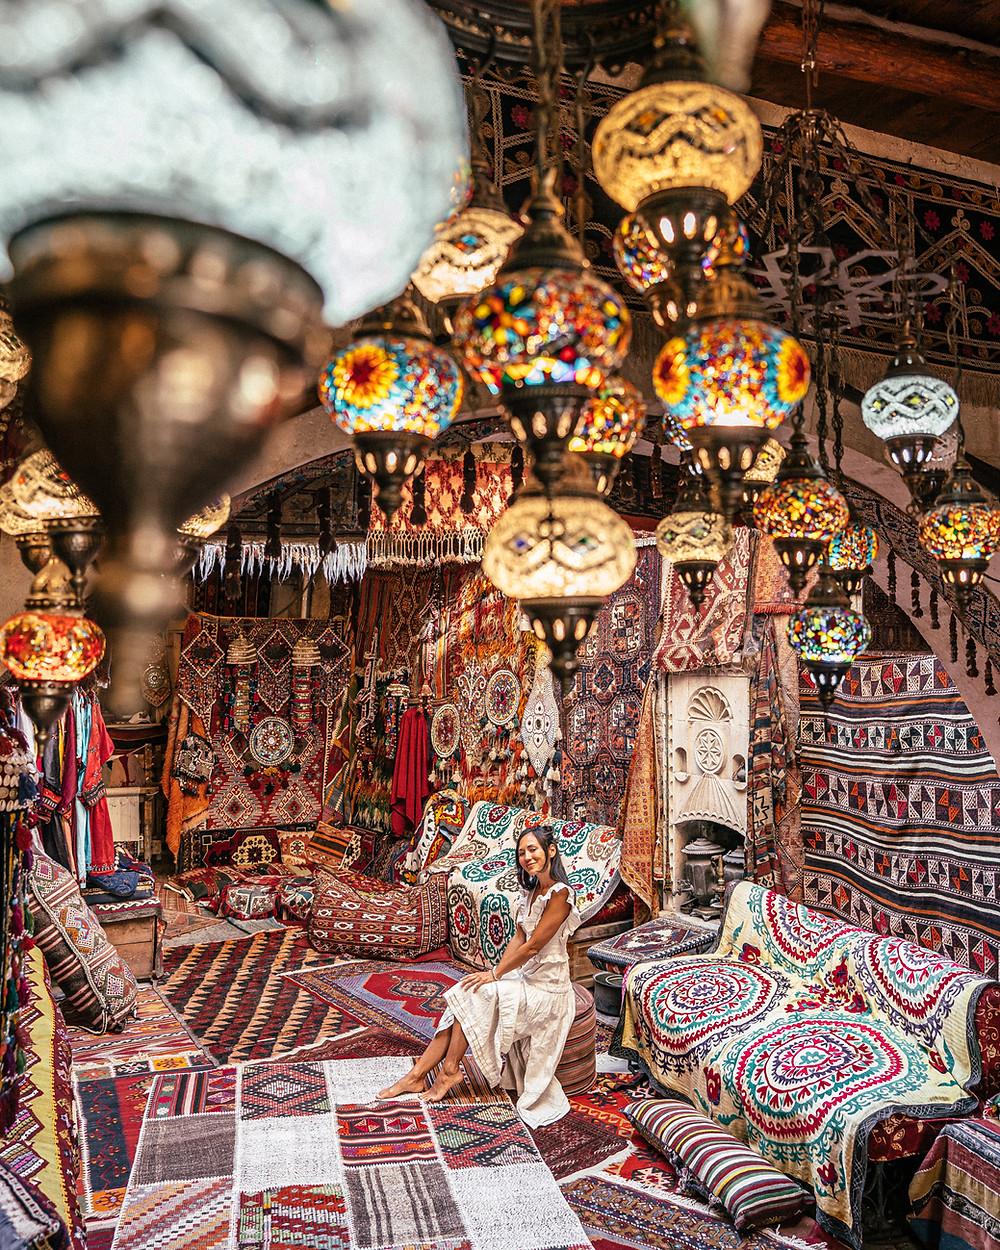 Sultan Carpets, Goreme, Cappadocia, Turkey